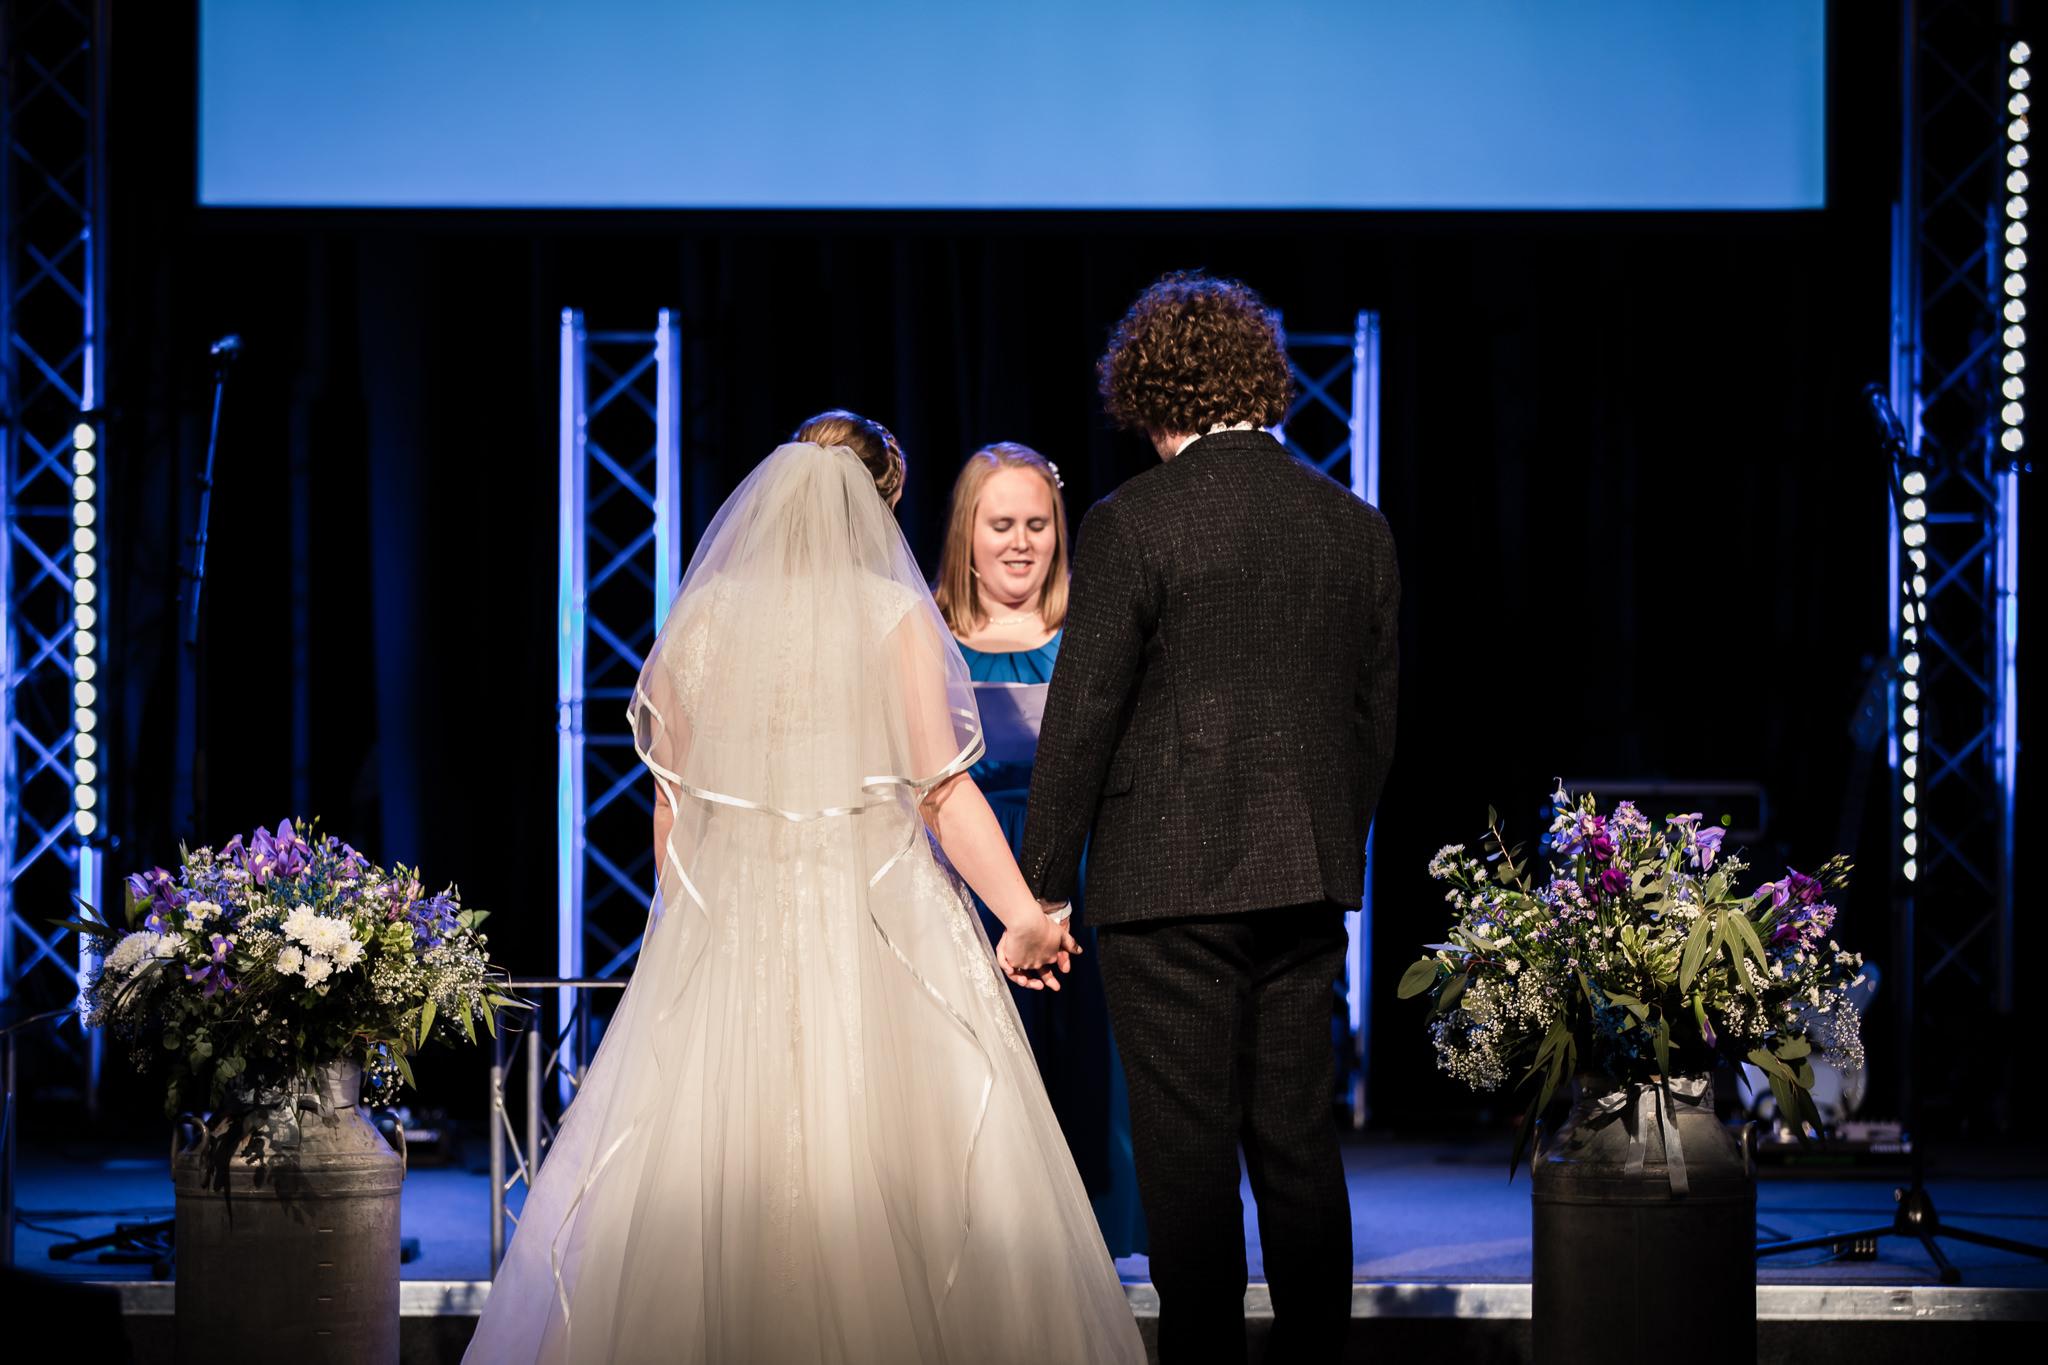 nottingham wedding23